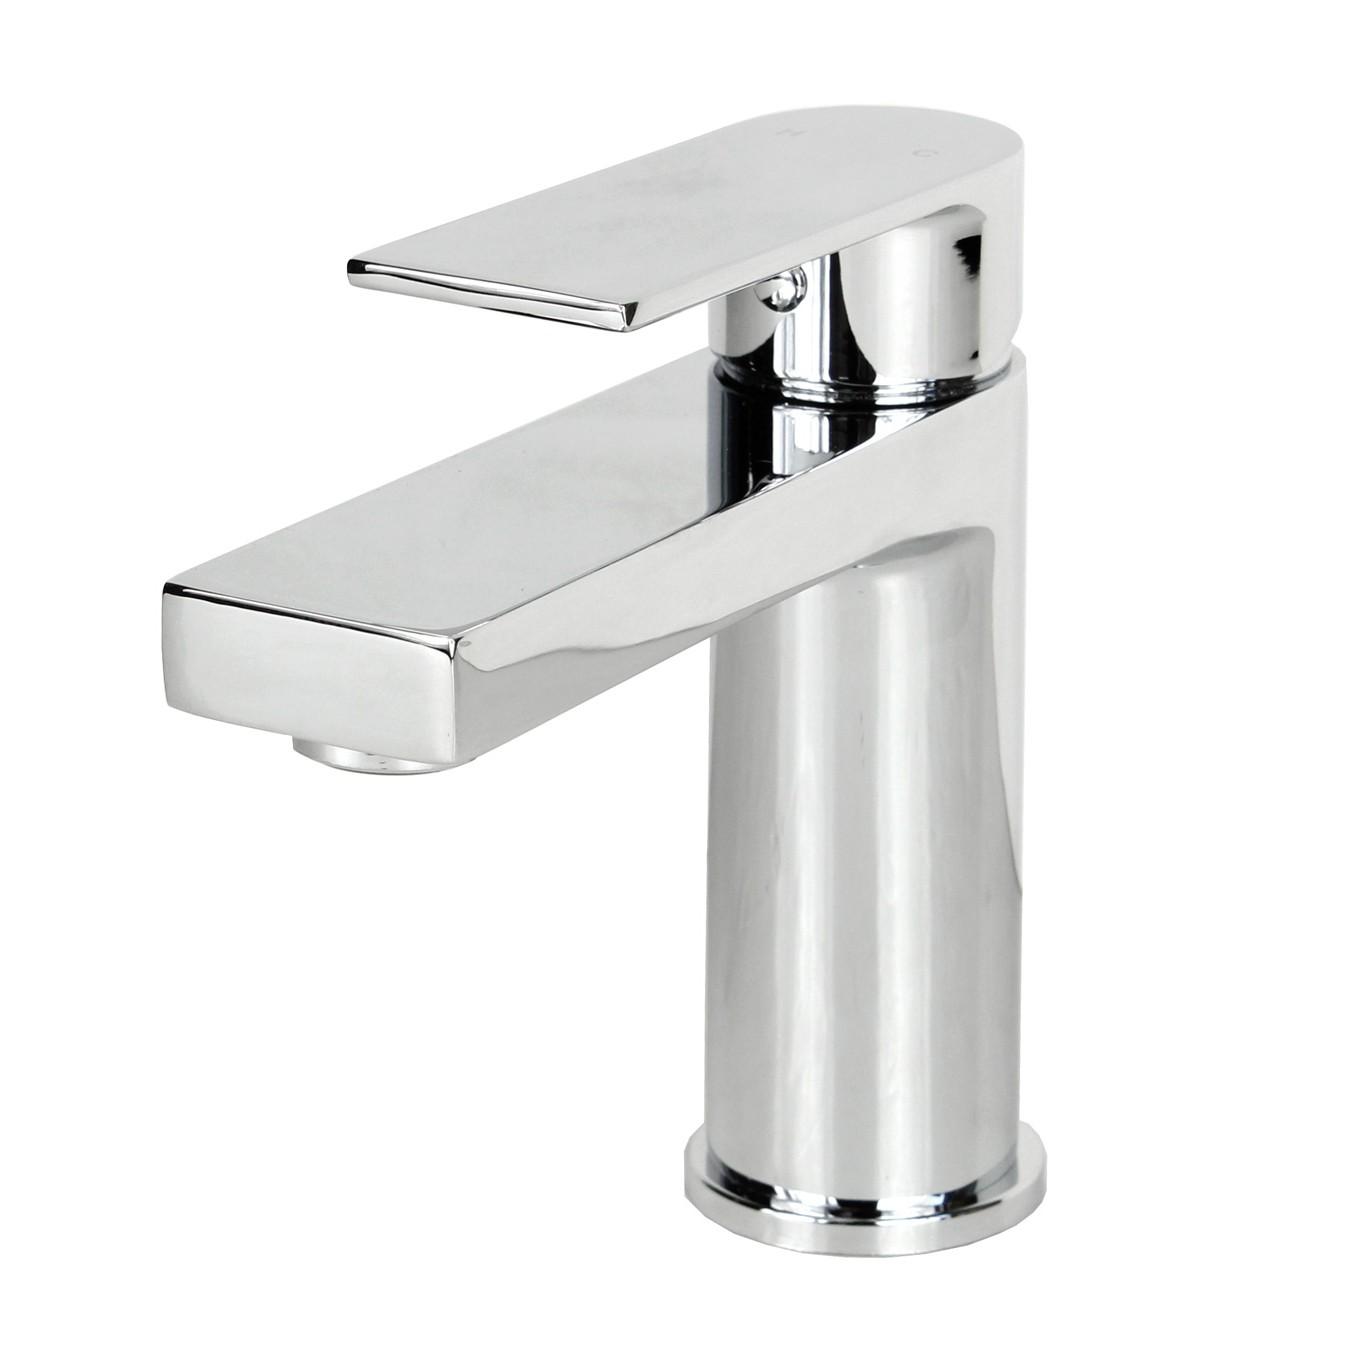 Anna polished chrome bathroom vessel sink single hole faucet - Anna s linens bathroom accessories ...